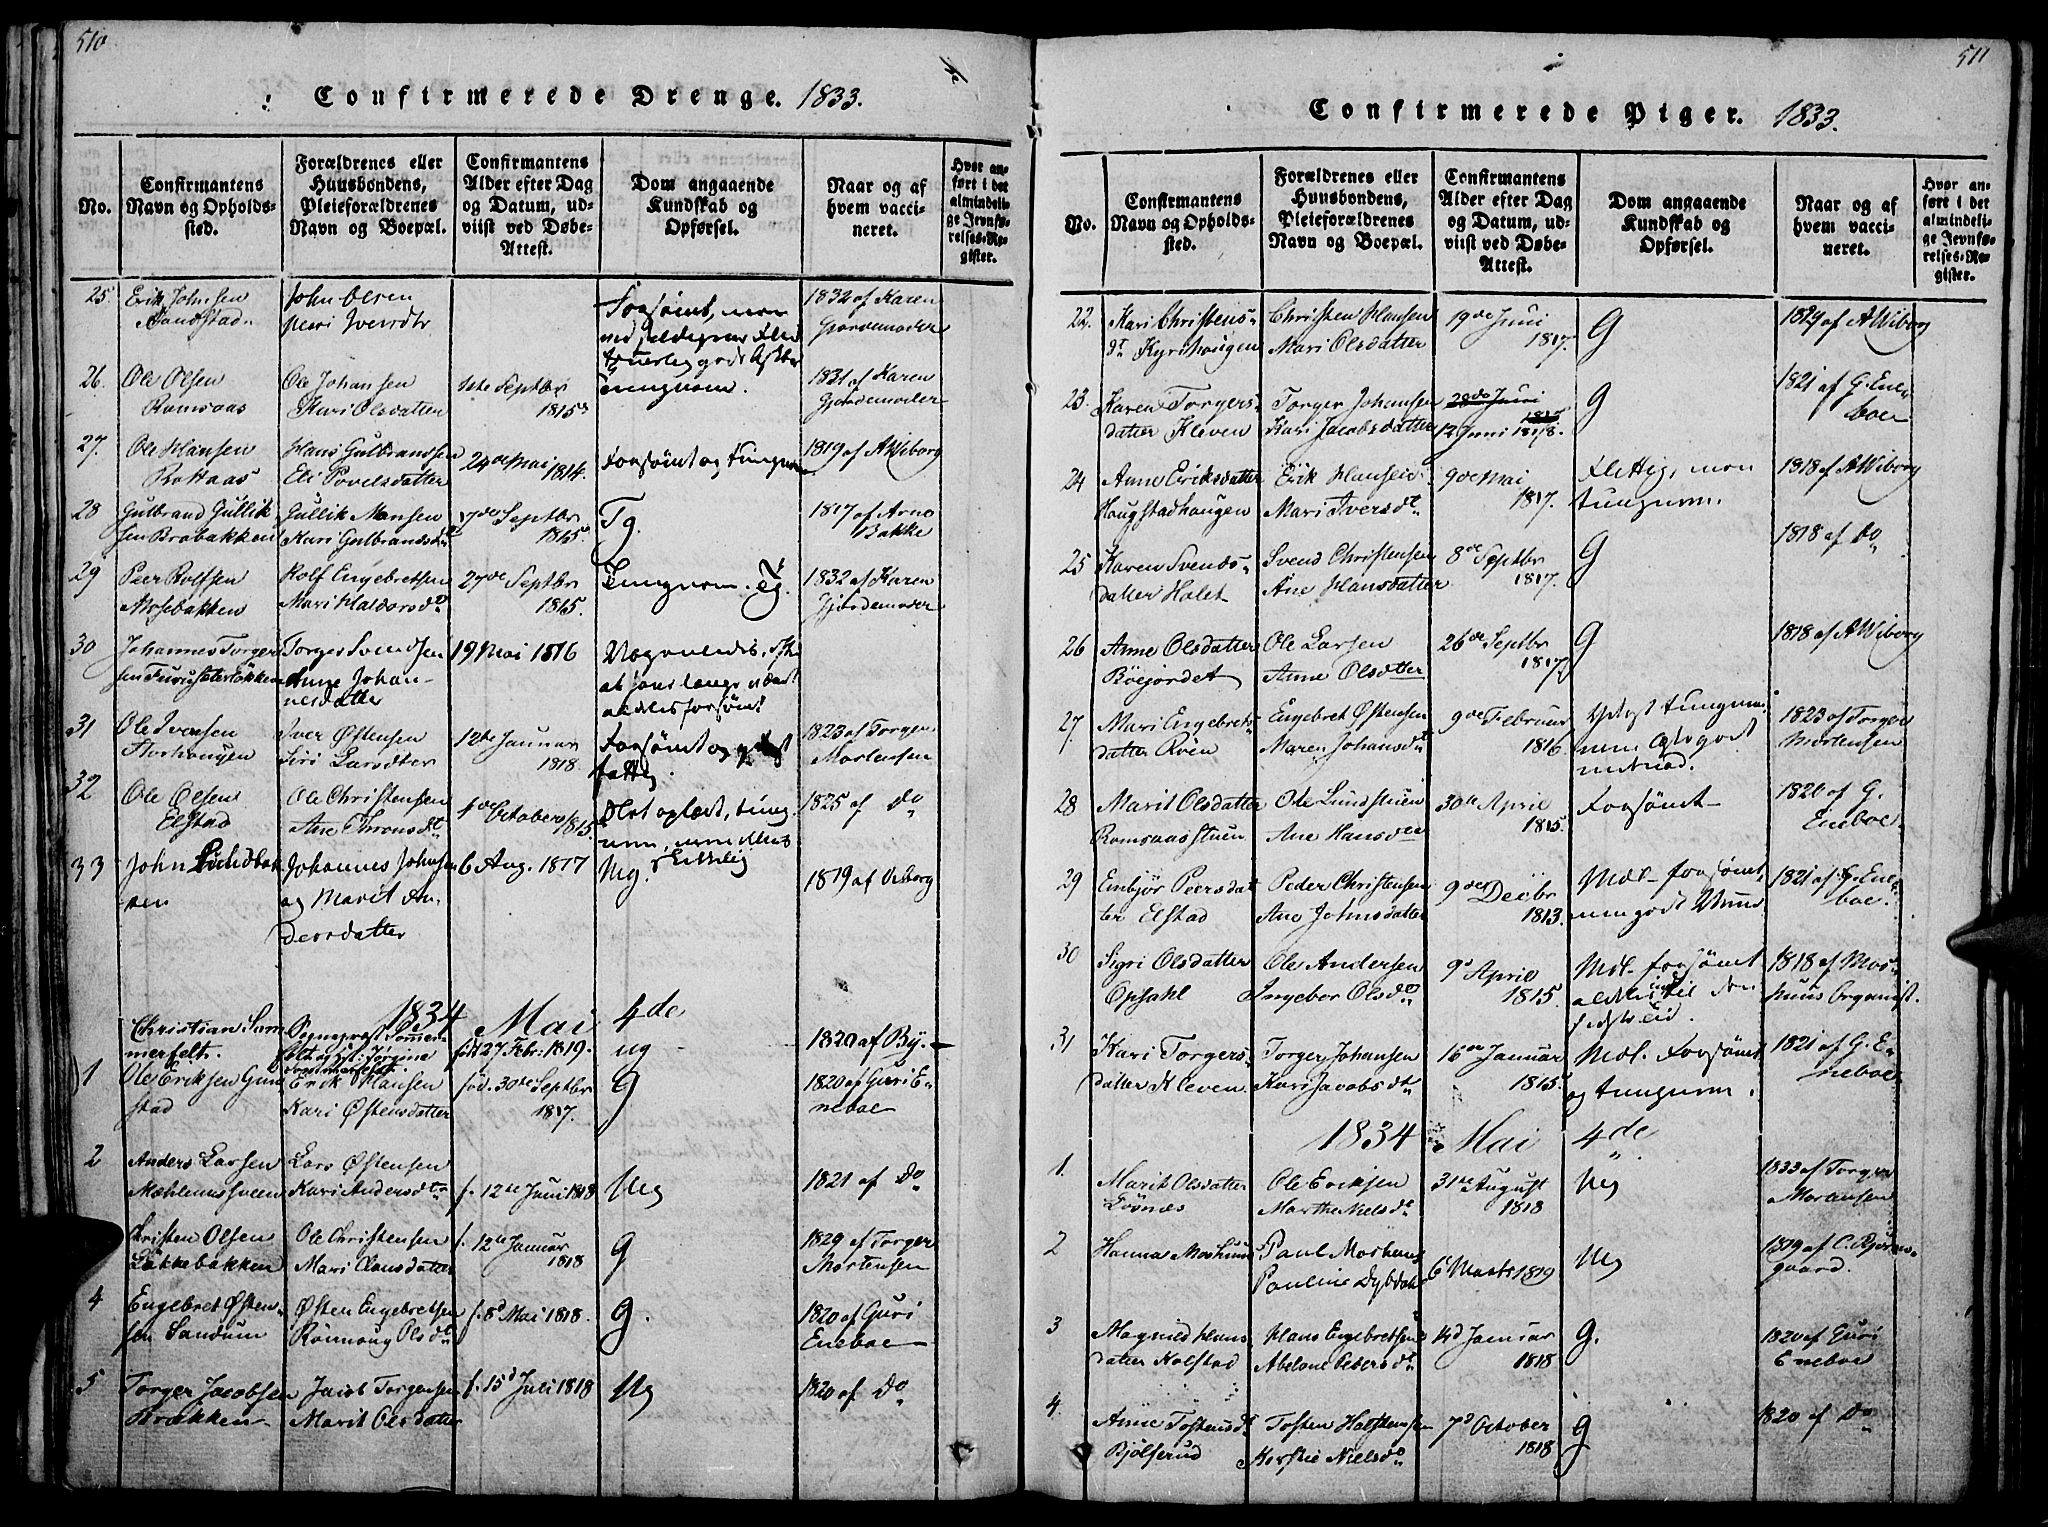 SAH, Ringebu prestekontor, Ministerialbok nr. 4, 1821-1839, s. 510-511